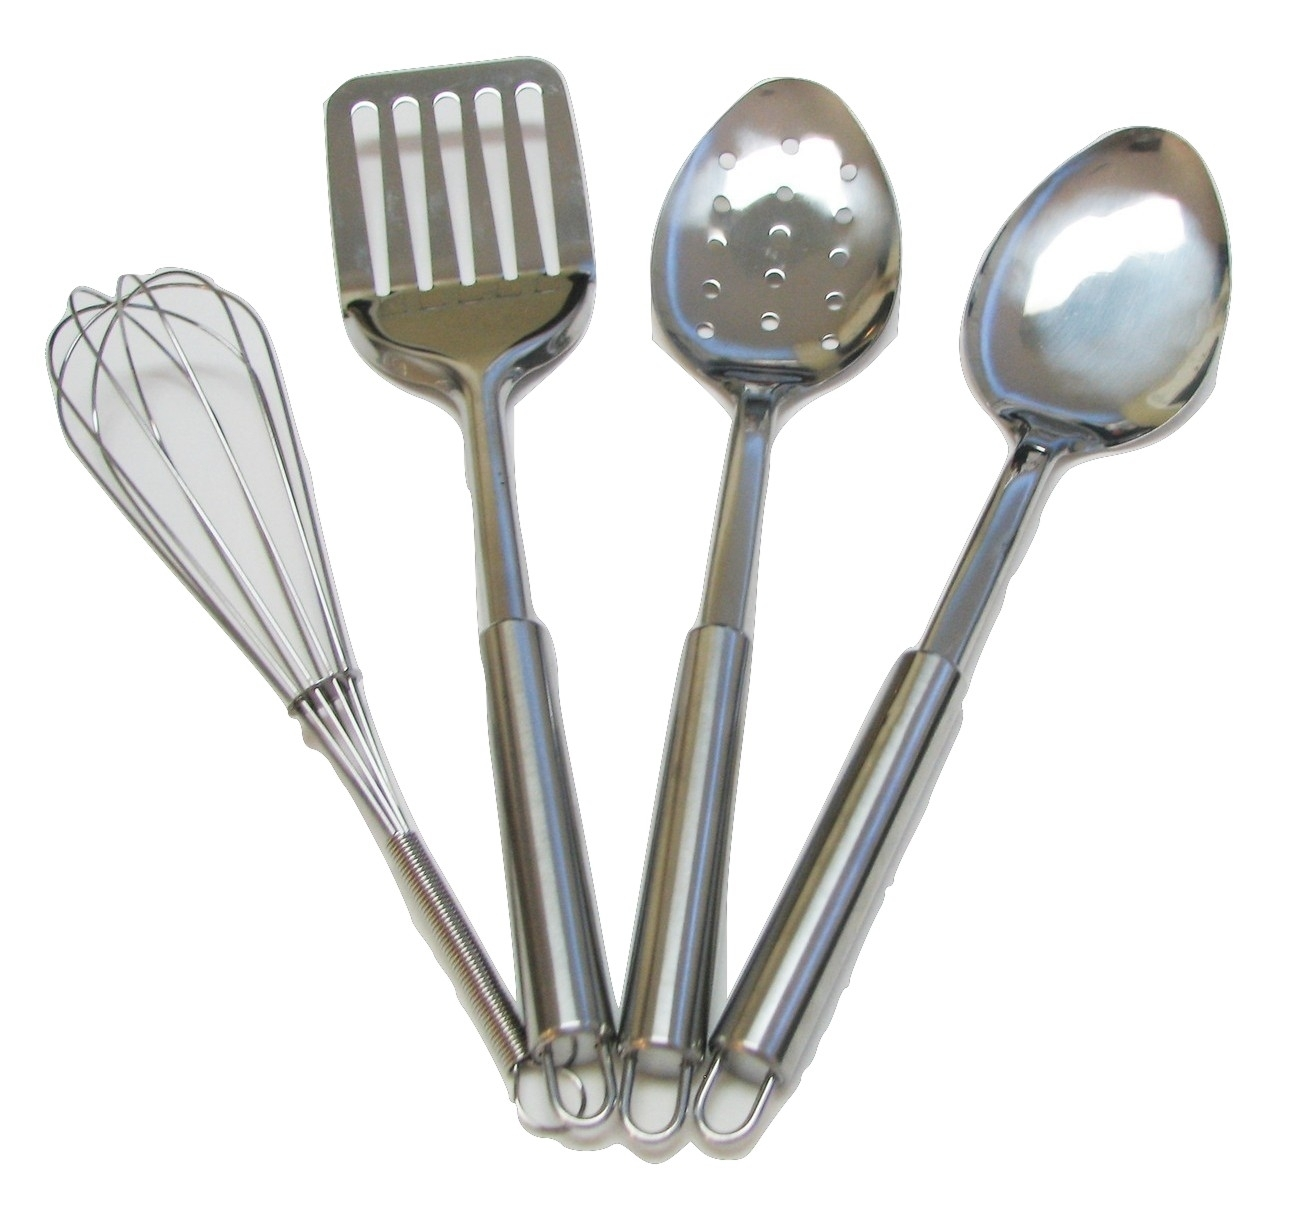 4 piece stainless steel kitchen utensil set cooking utensils for Kitchen set stainless